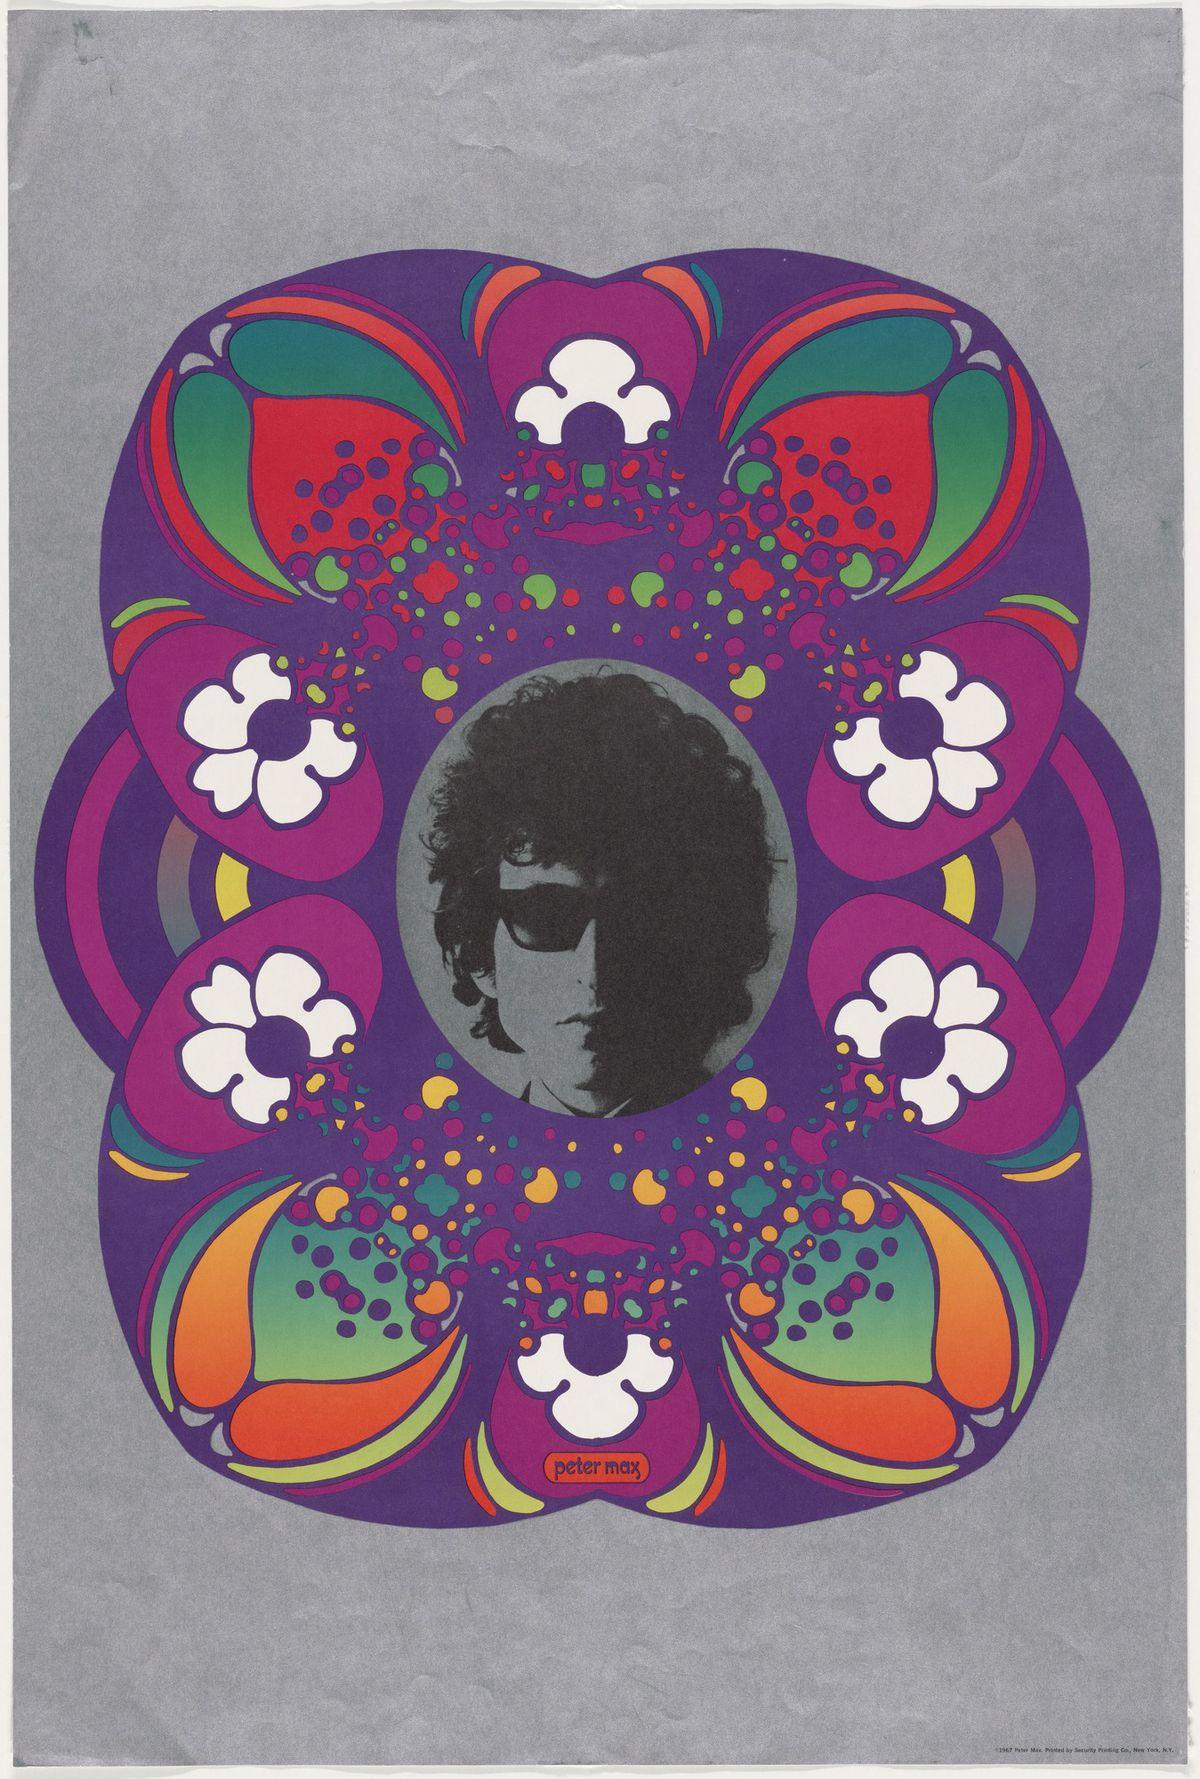 1967 portrait of Bob Dylan